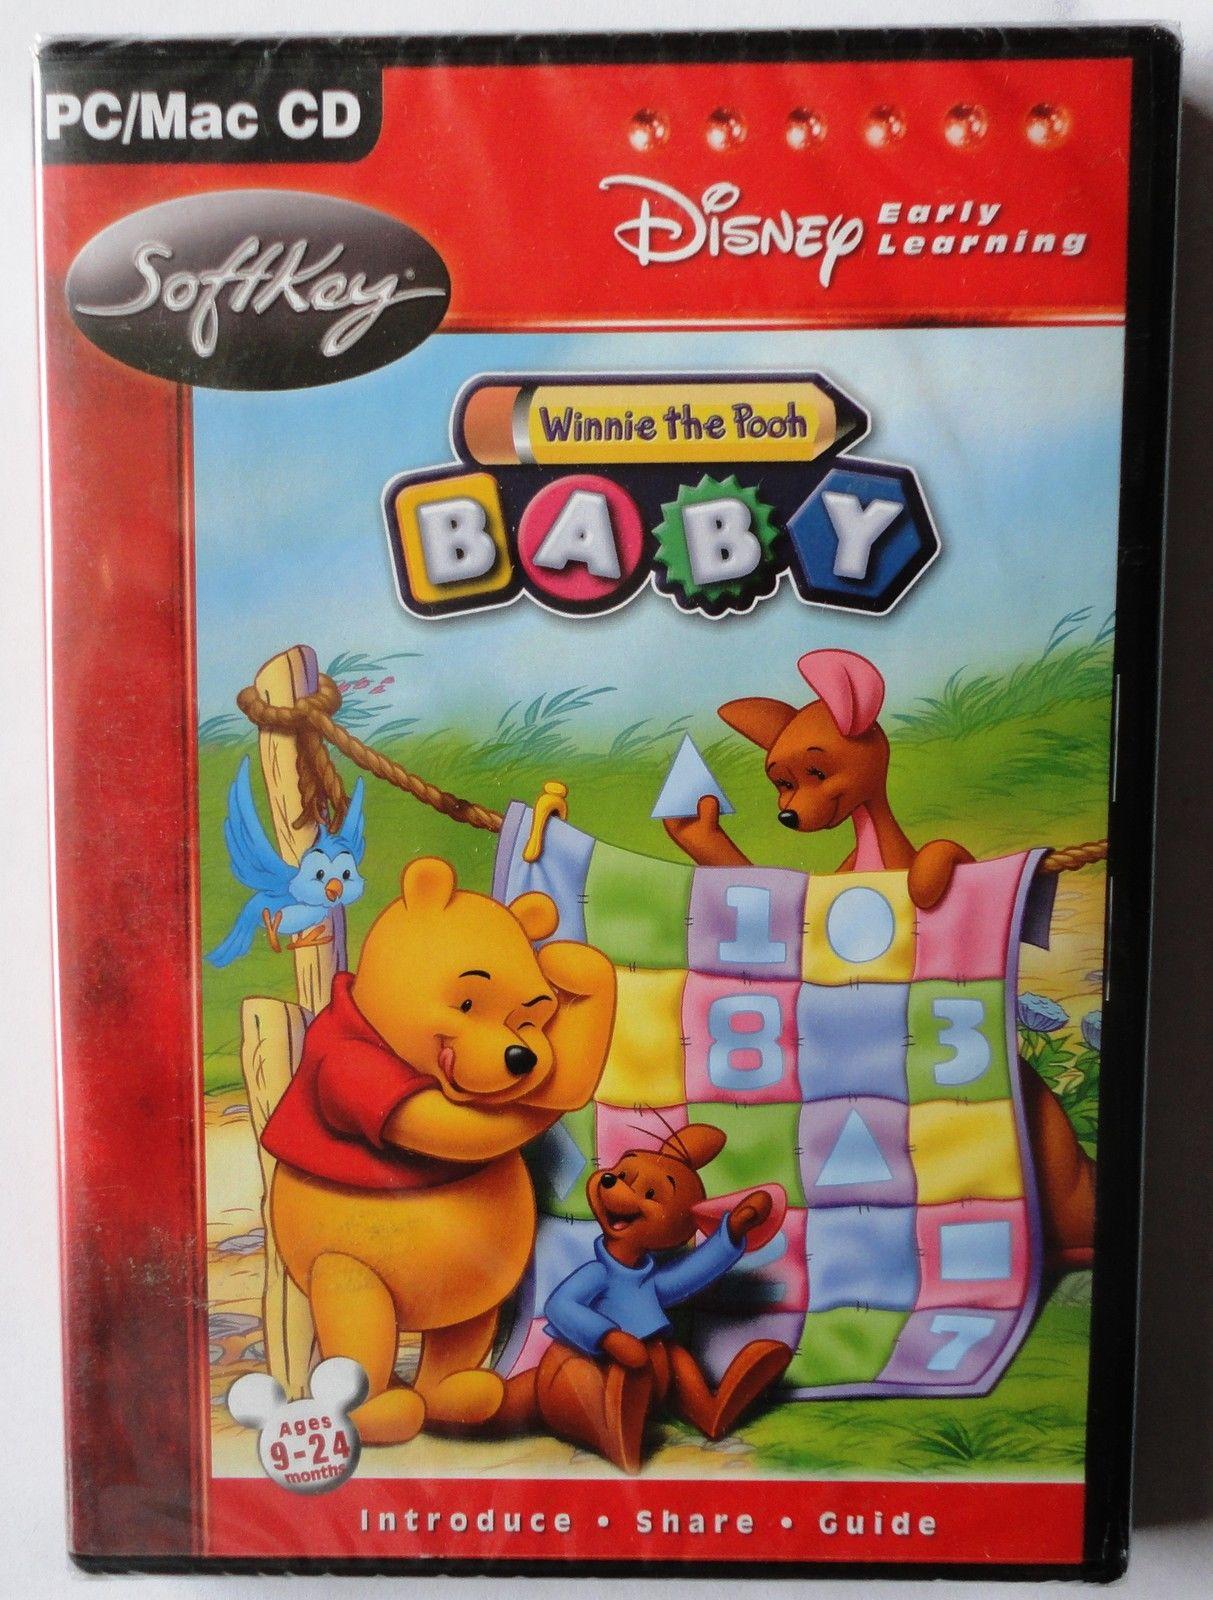 Game boy color pooh wiki - Game Boy Color Pooh Wiki 8